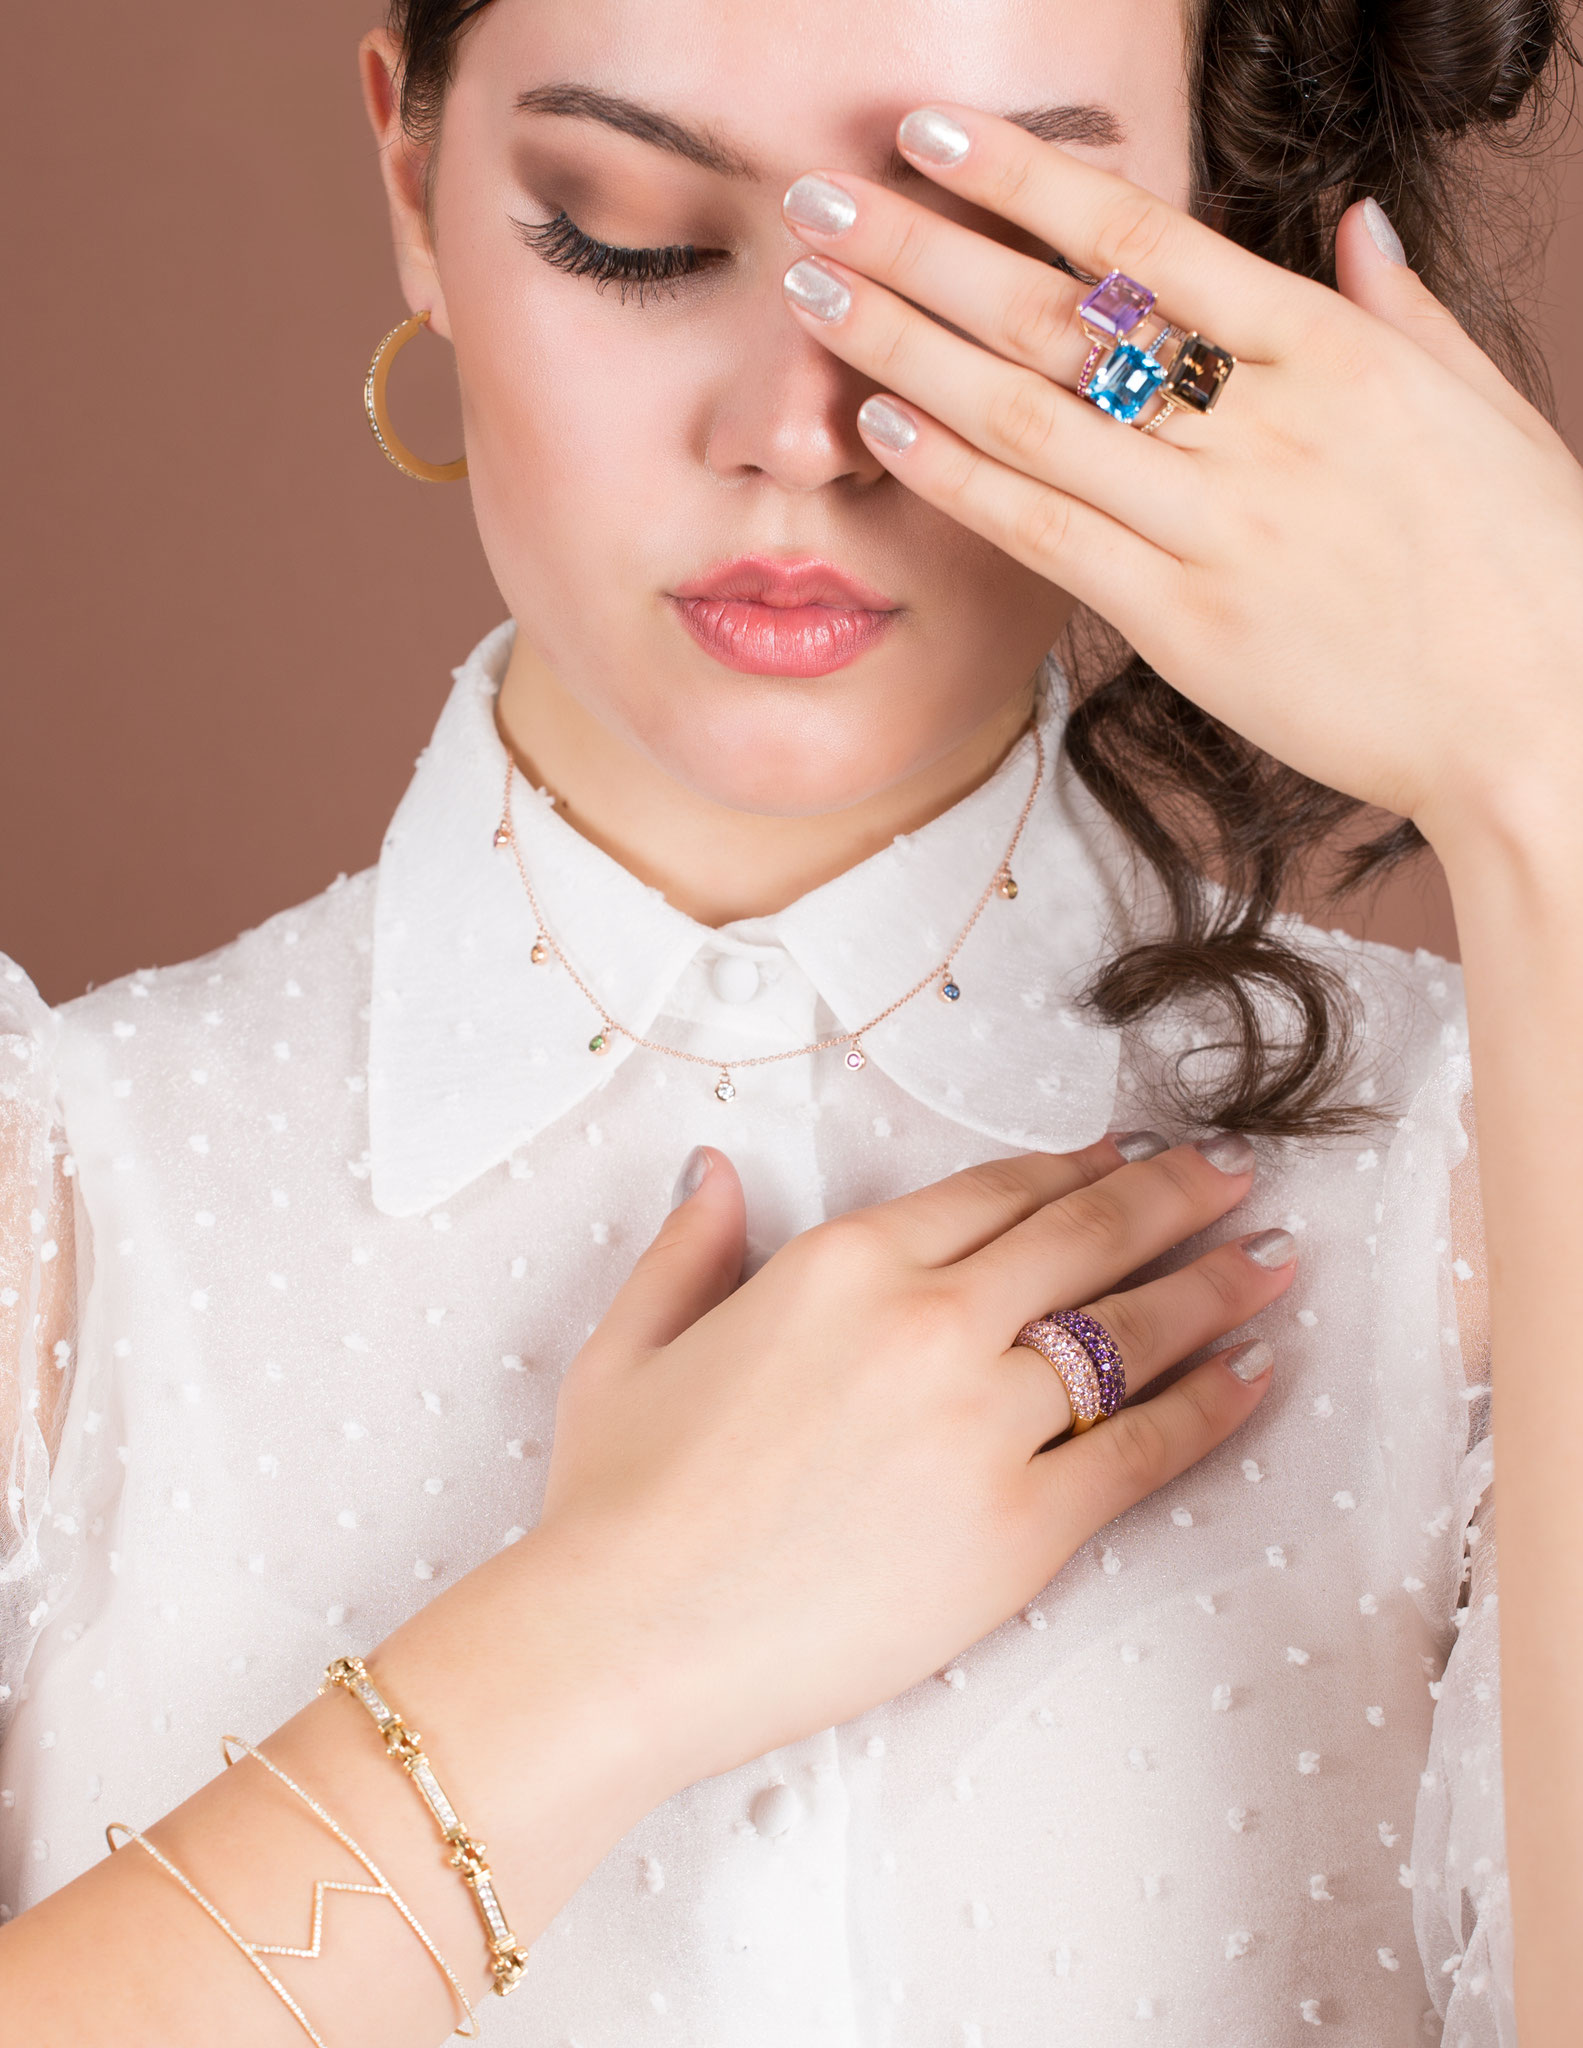 Visions of Jewls - GMARO PARIS, December 2020 - Fashion Stylist: Vesna Resch